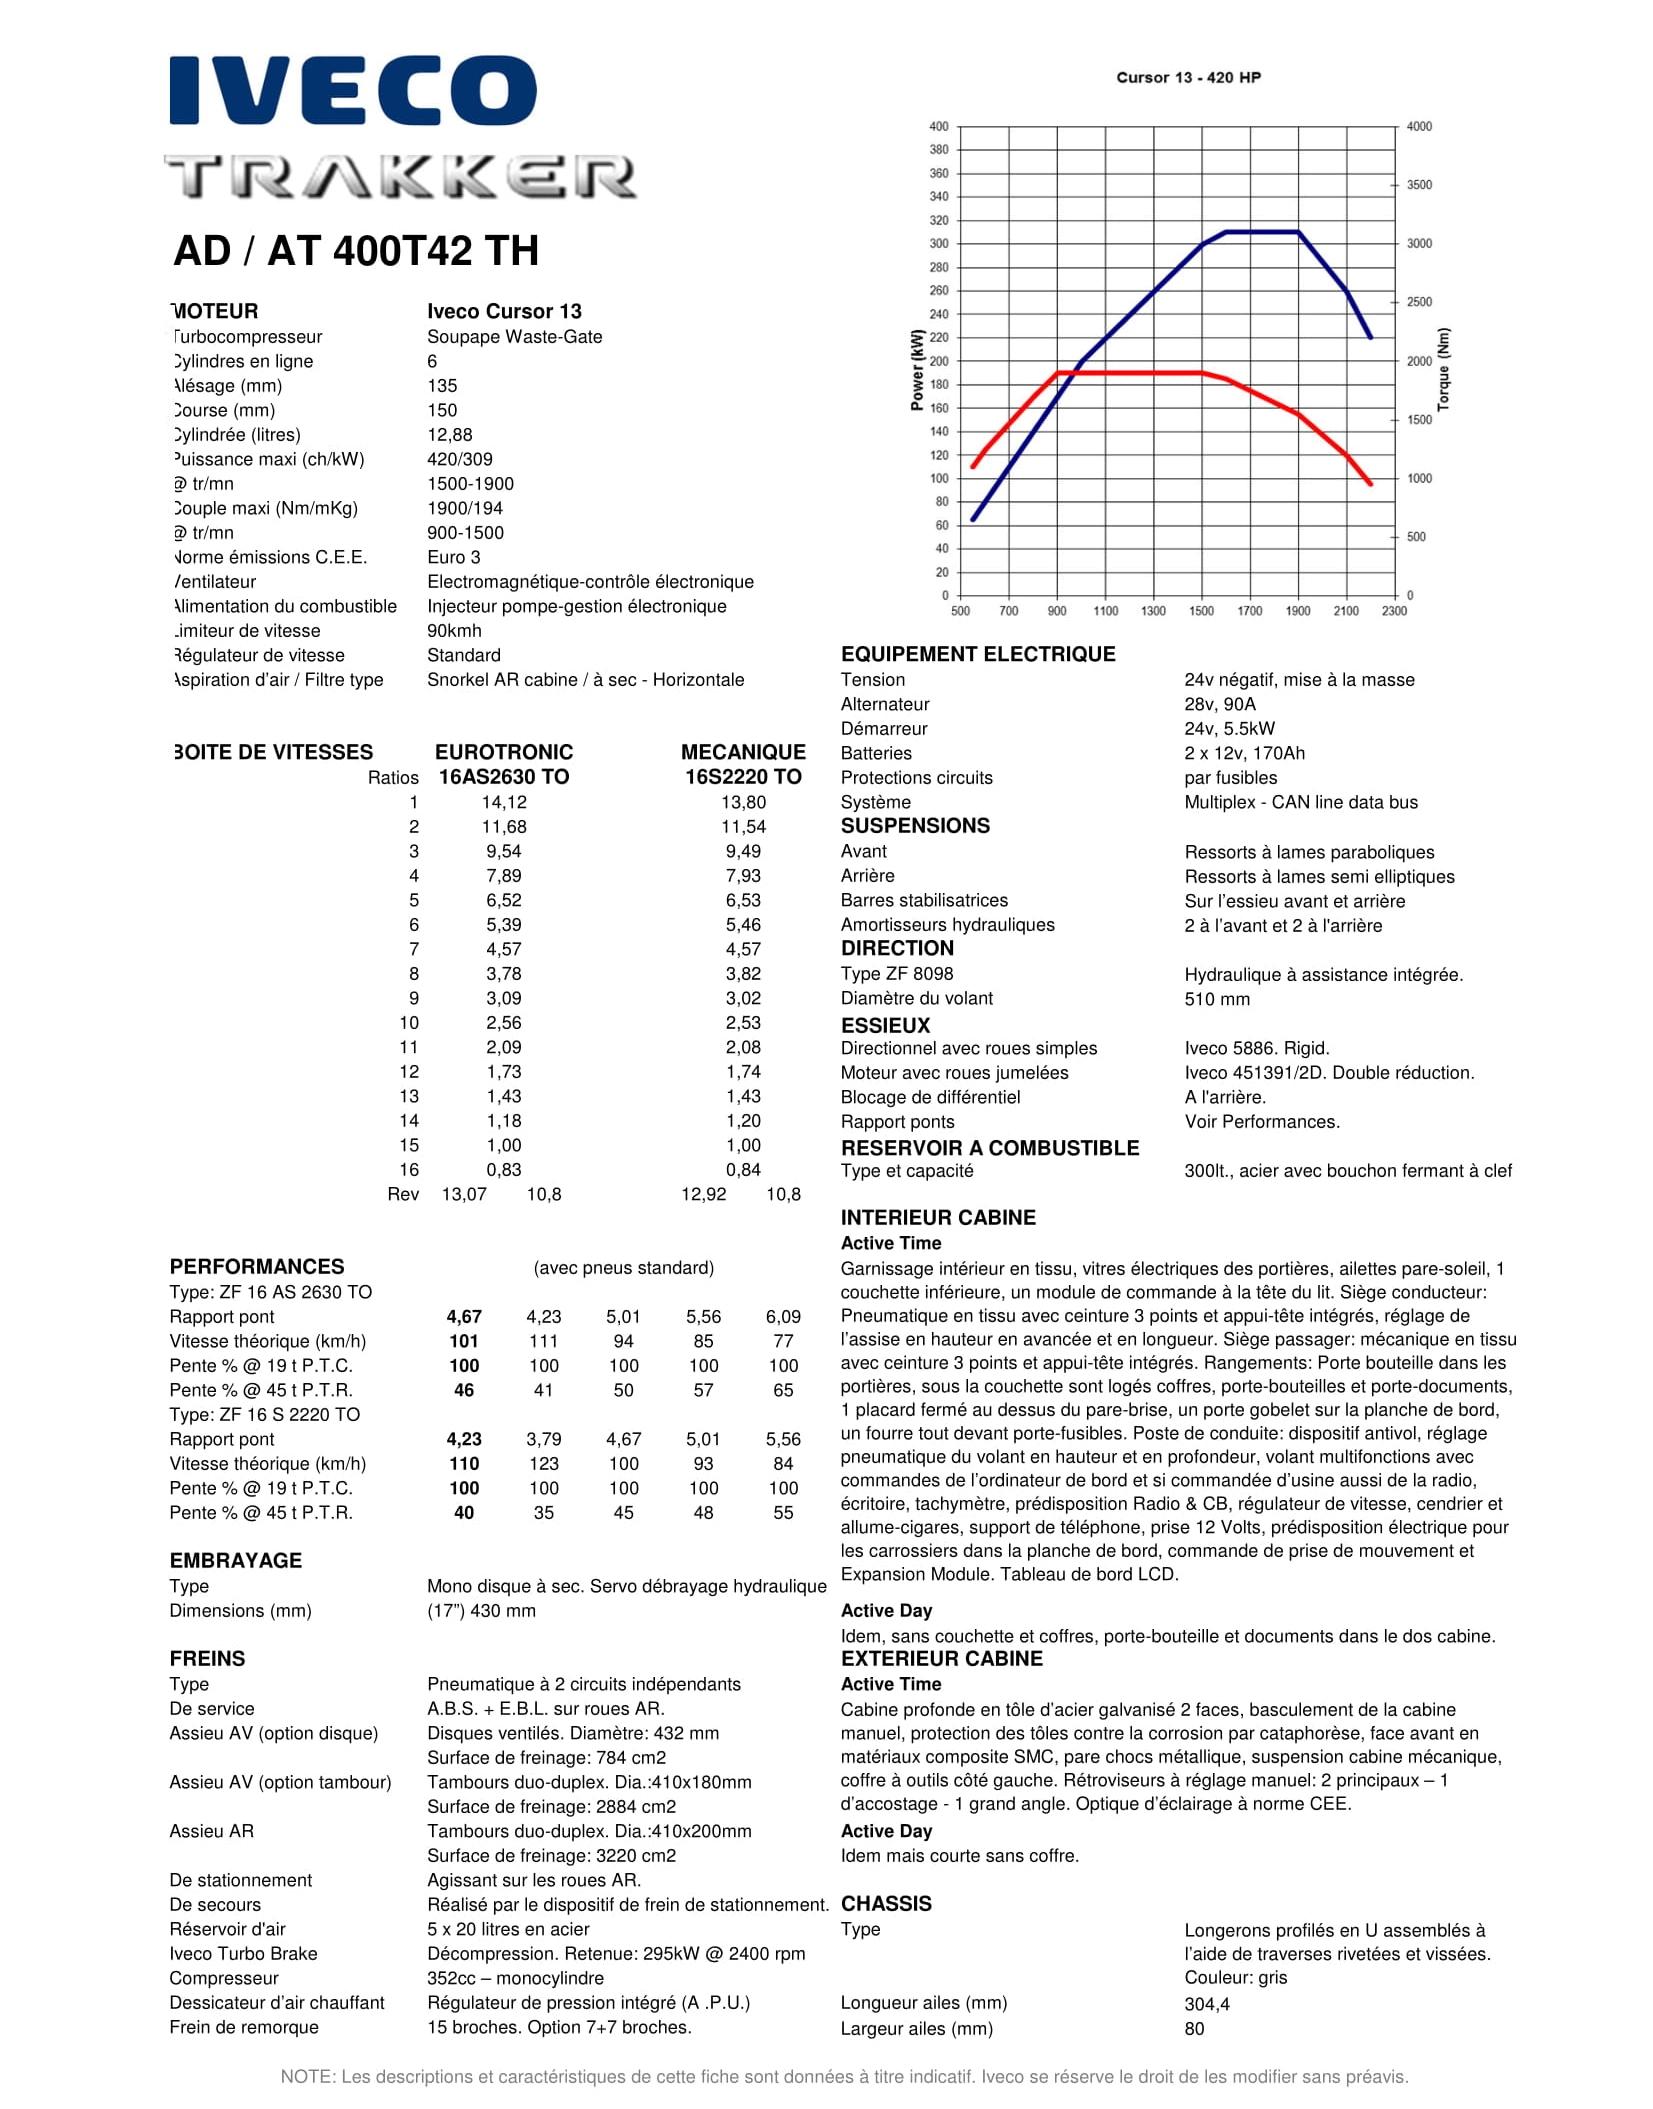 19 AD 400T42 TH - FR-2